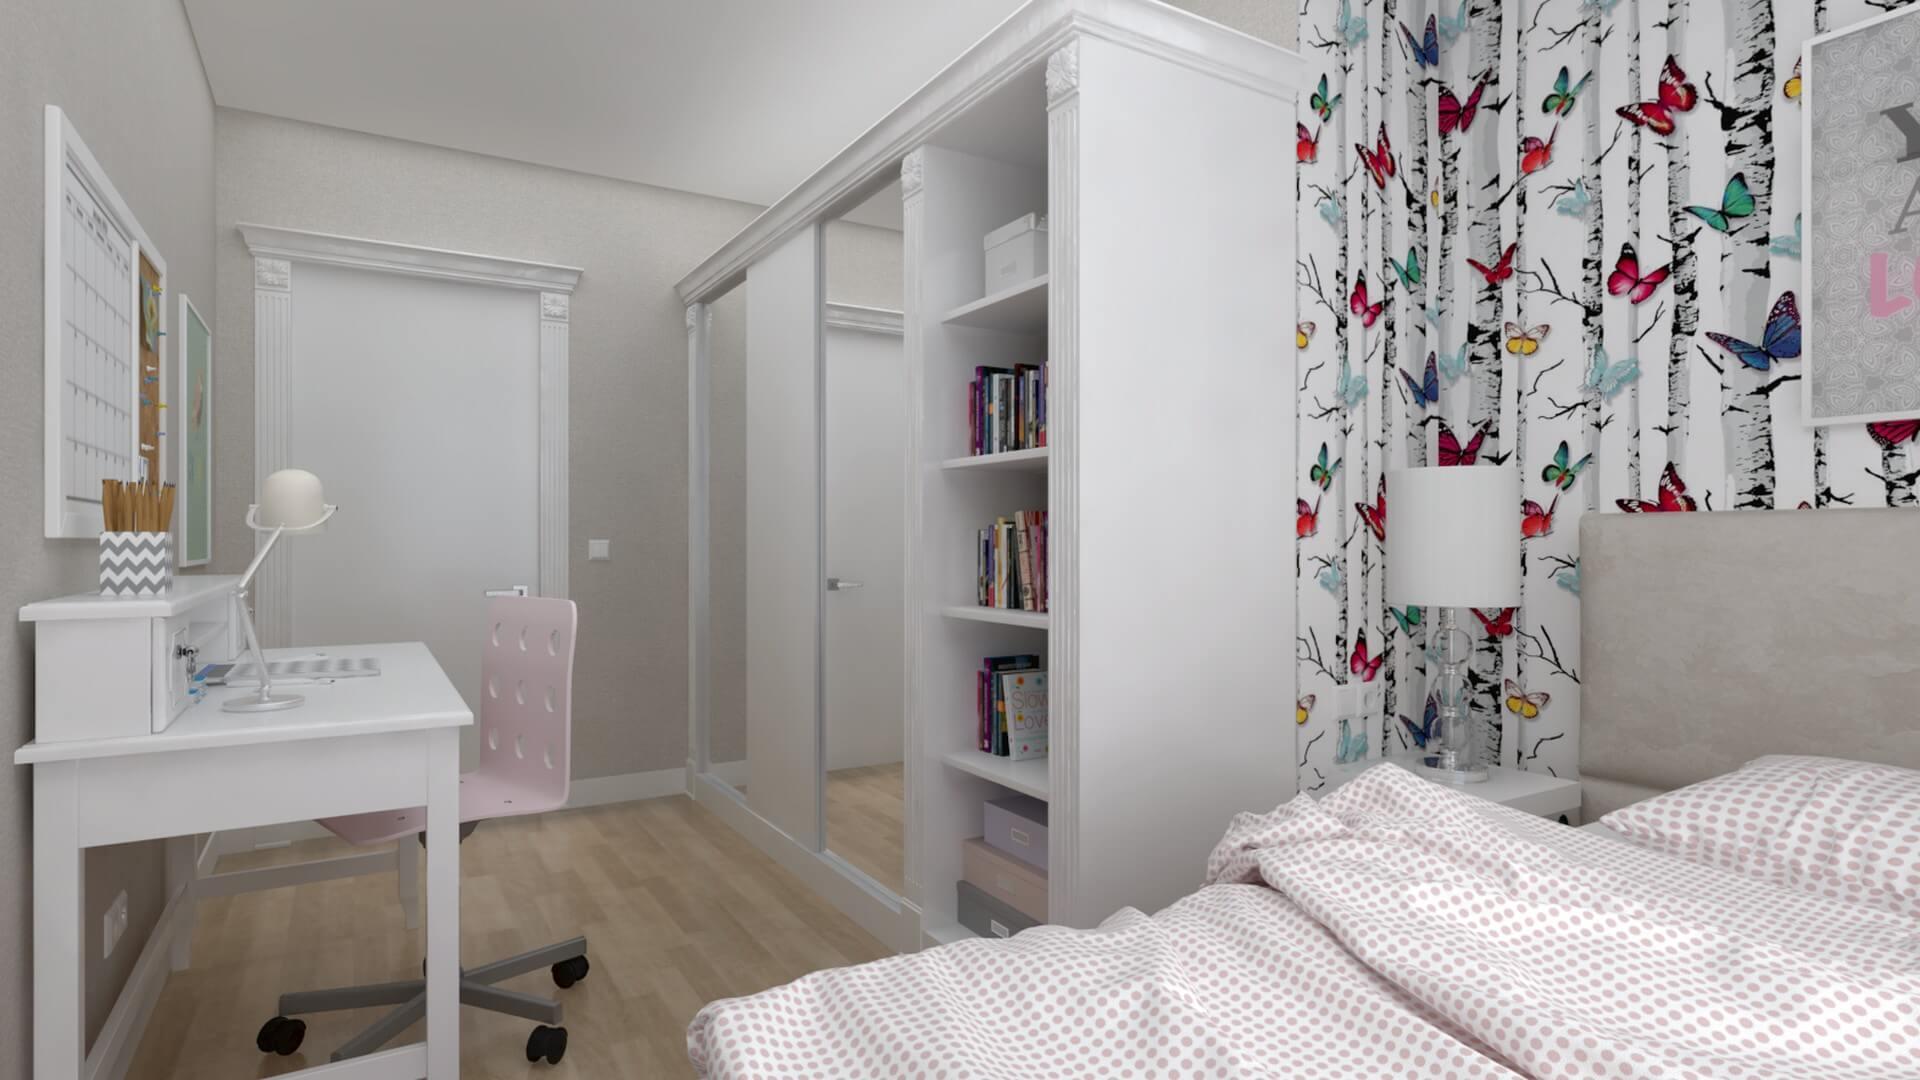 D. Unal Flat, Residential